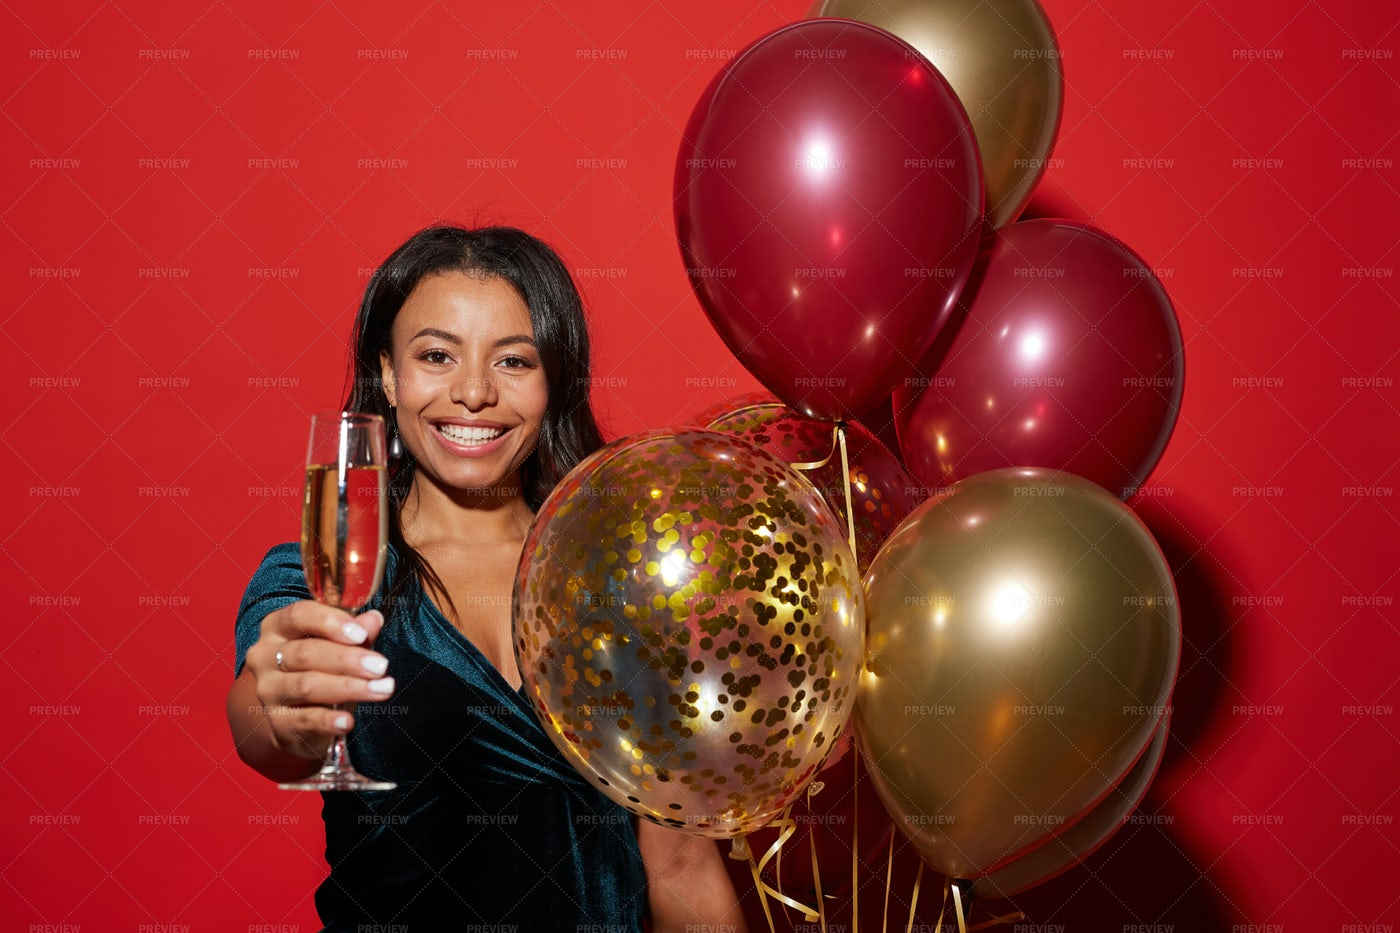 Cheerful Mixed-Race Woman Posing...: Stock Photos